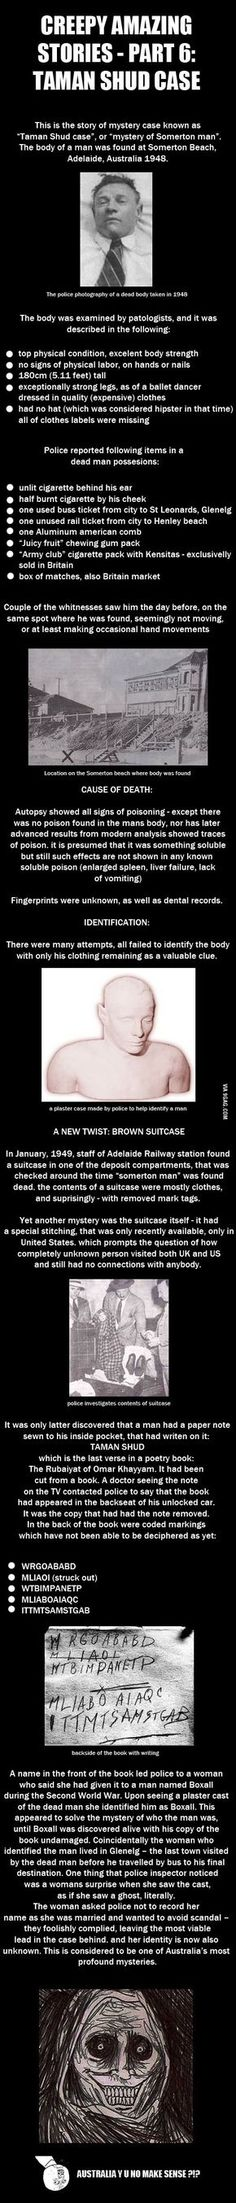 Creepy Amazing Stoires Pt 6: Taman Shud Case